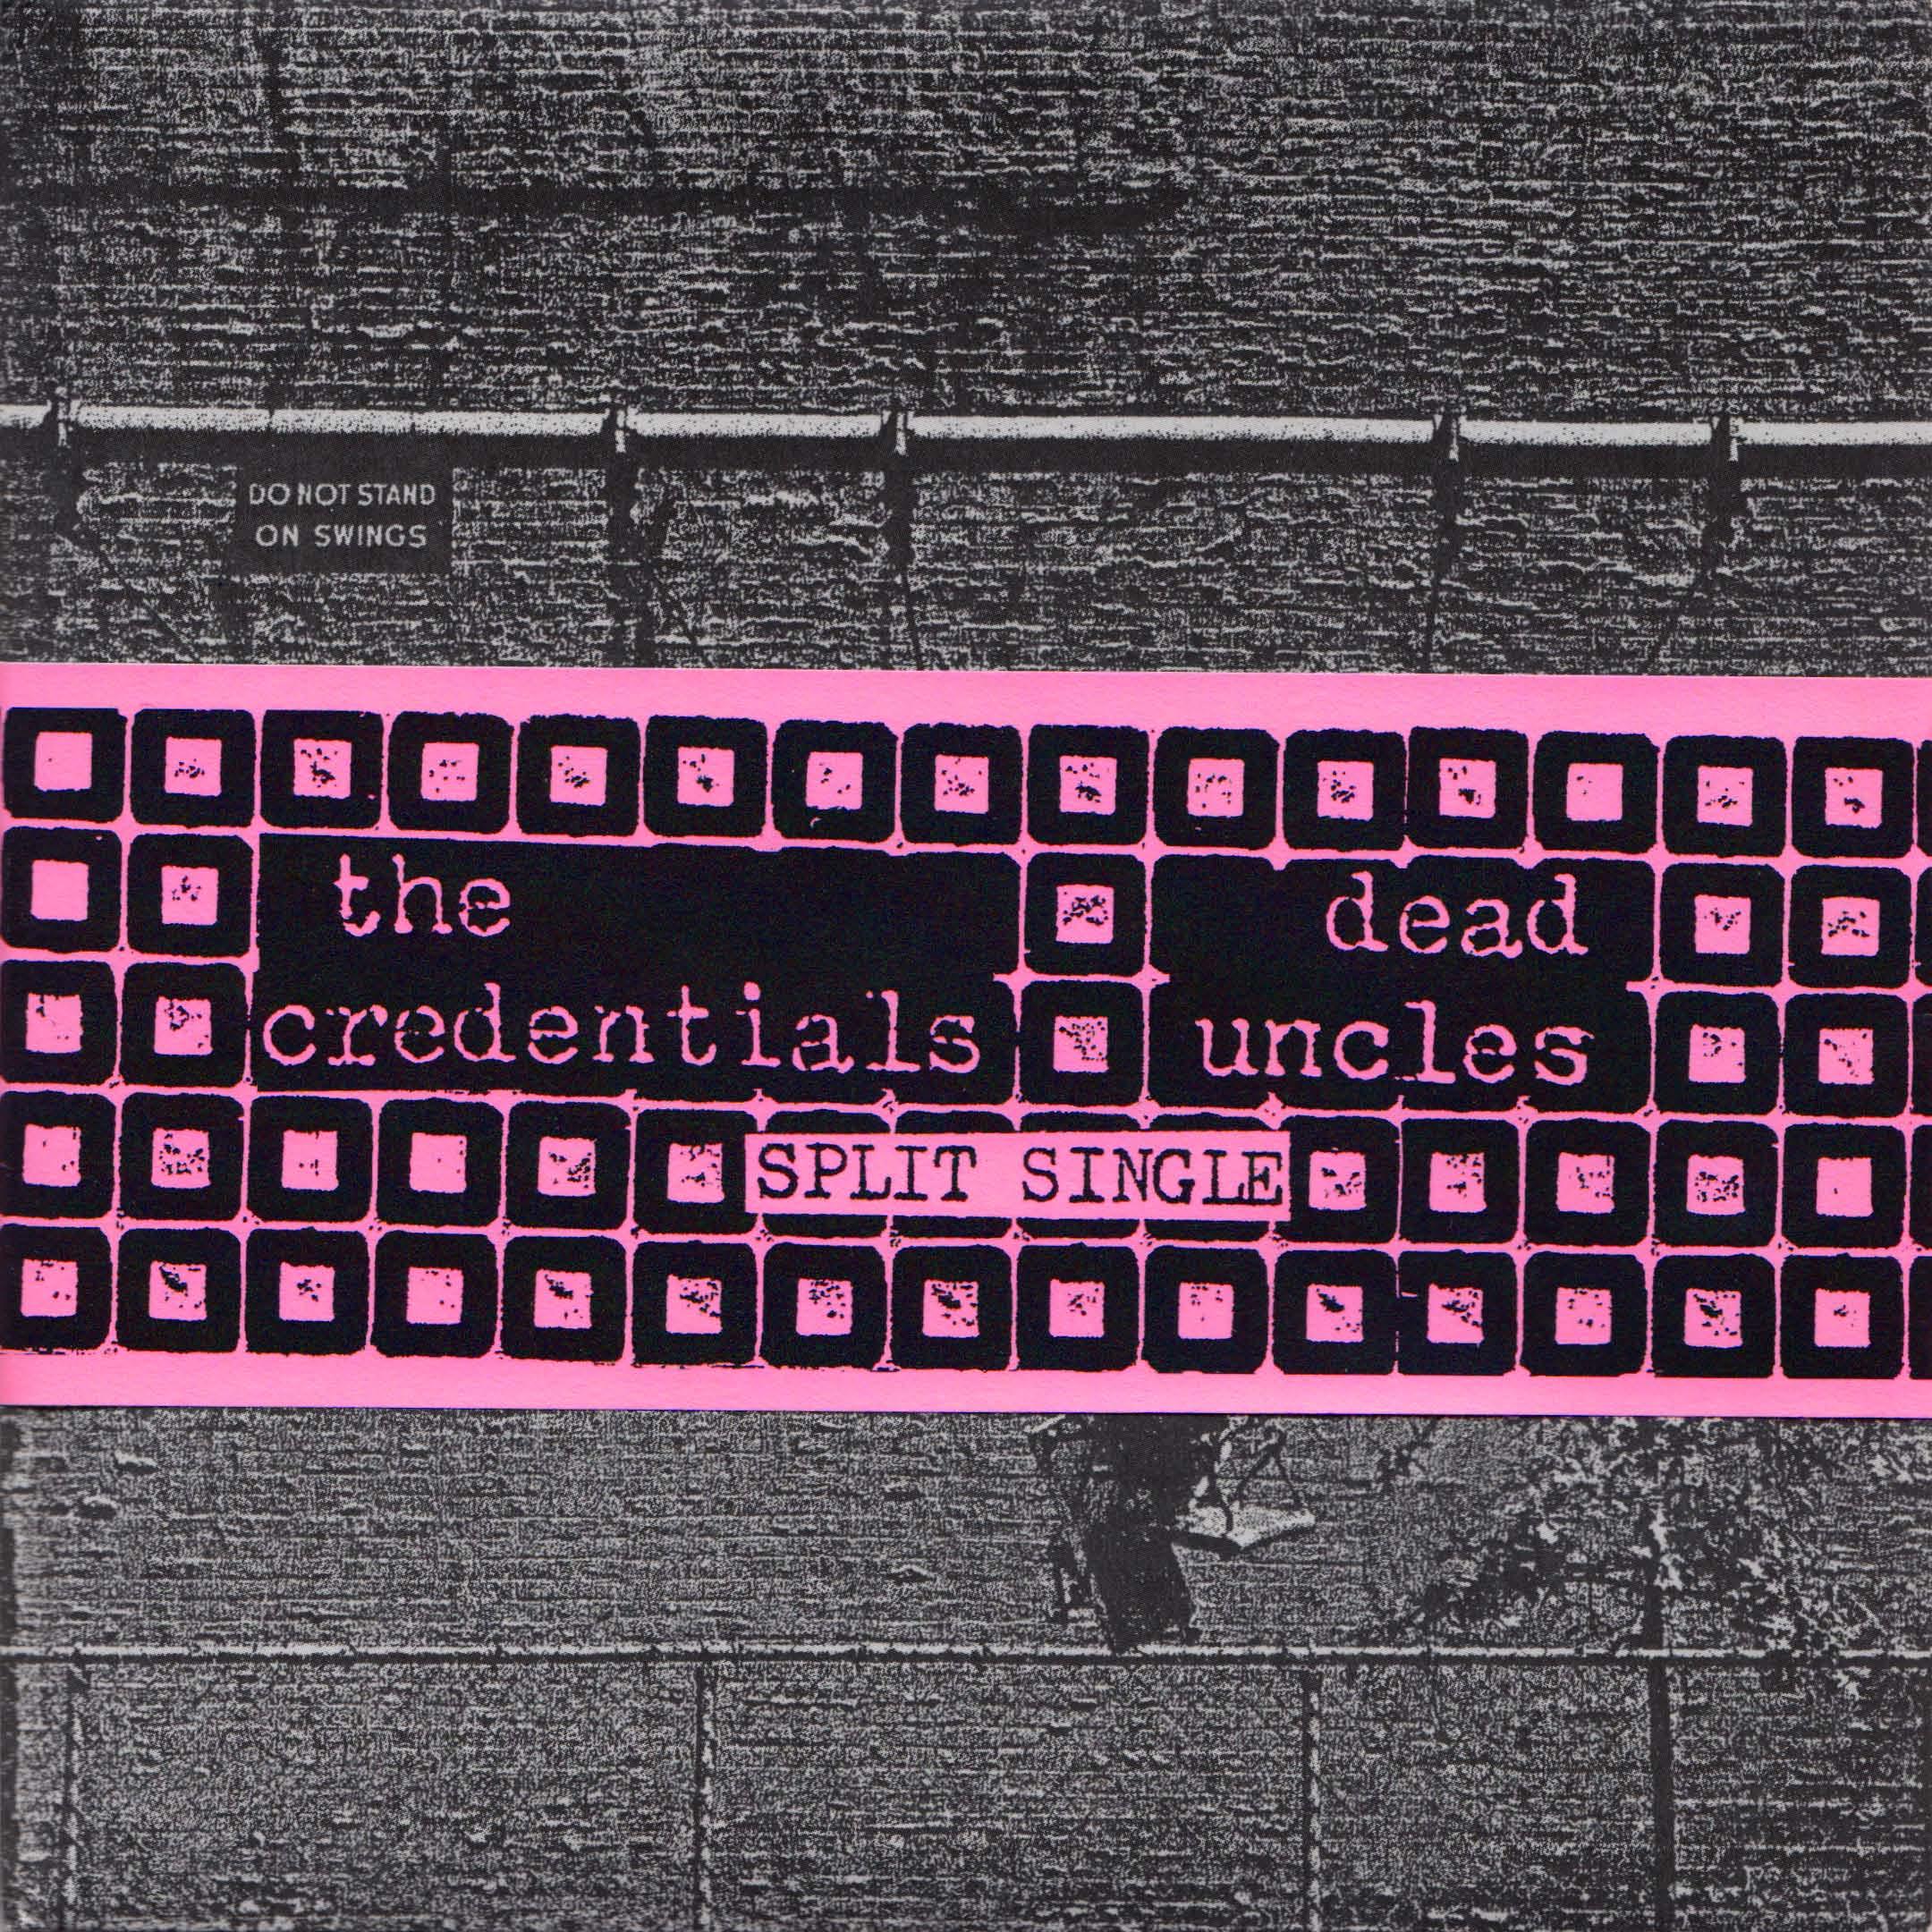 DEAD UNCLES / THE CREDENTIALS split 7